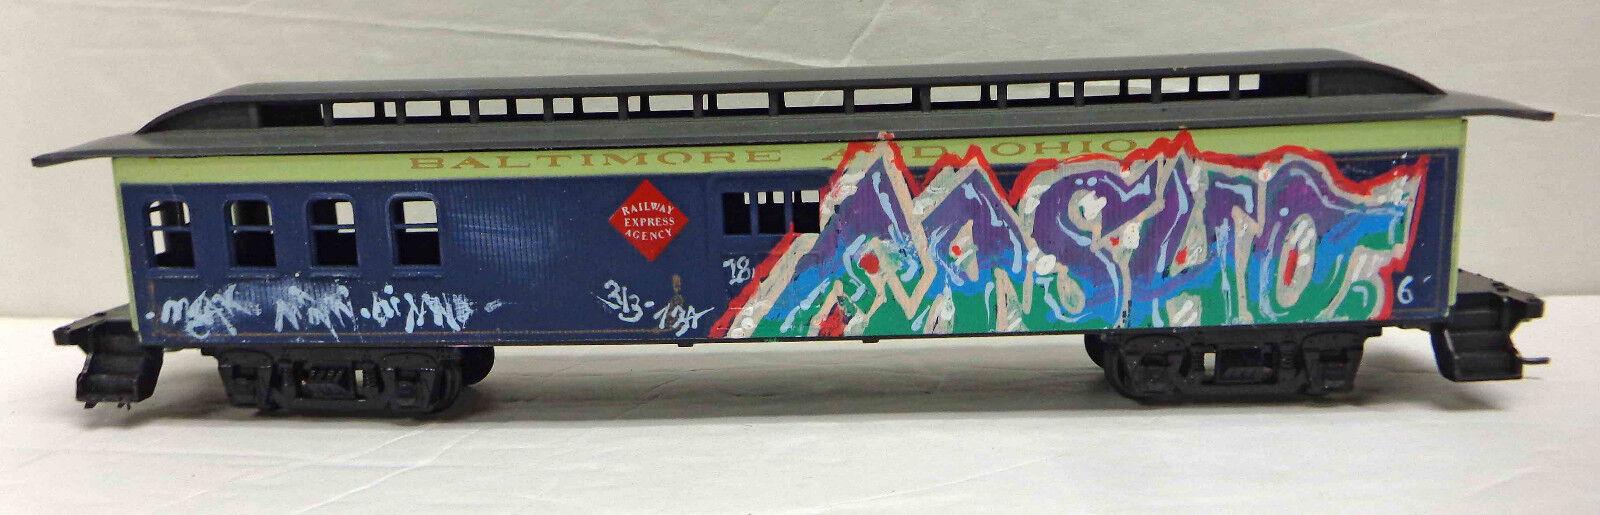 HO Scale Baltimore & Ohio Hand Painted Graffiti Passenger Car